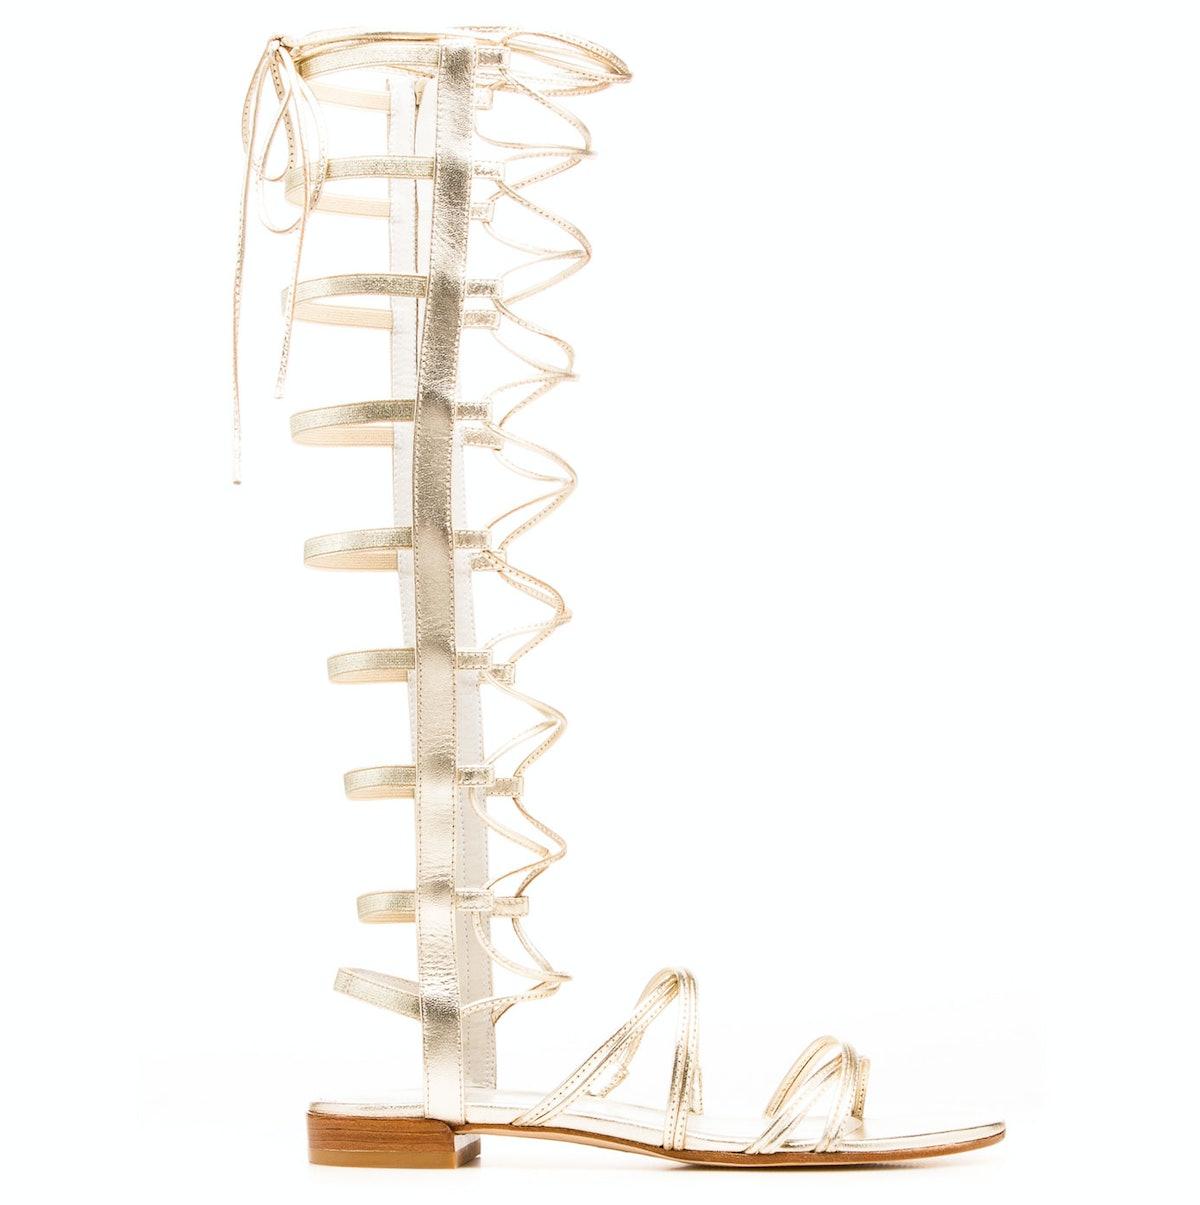 Stuart Weitzman gladiator sandals